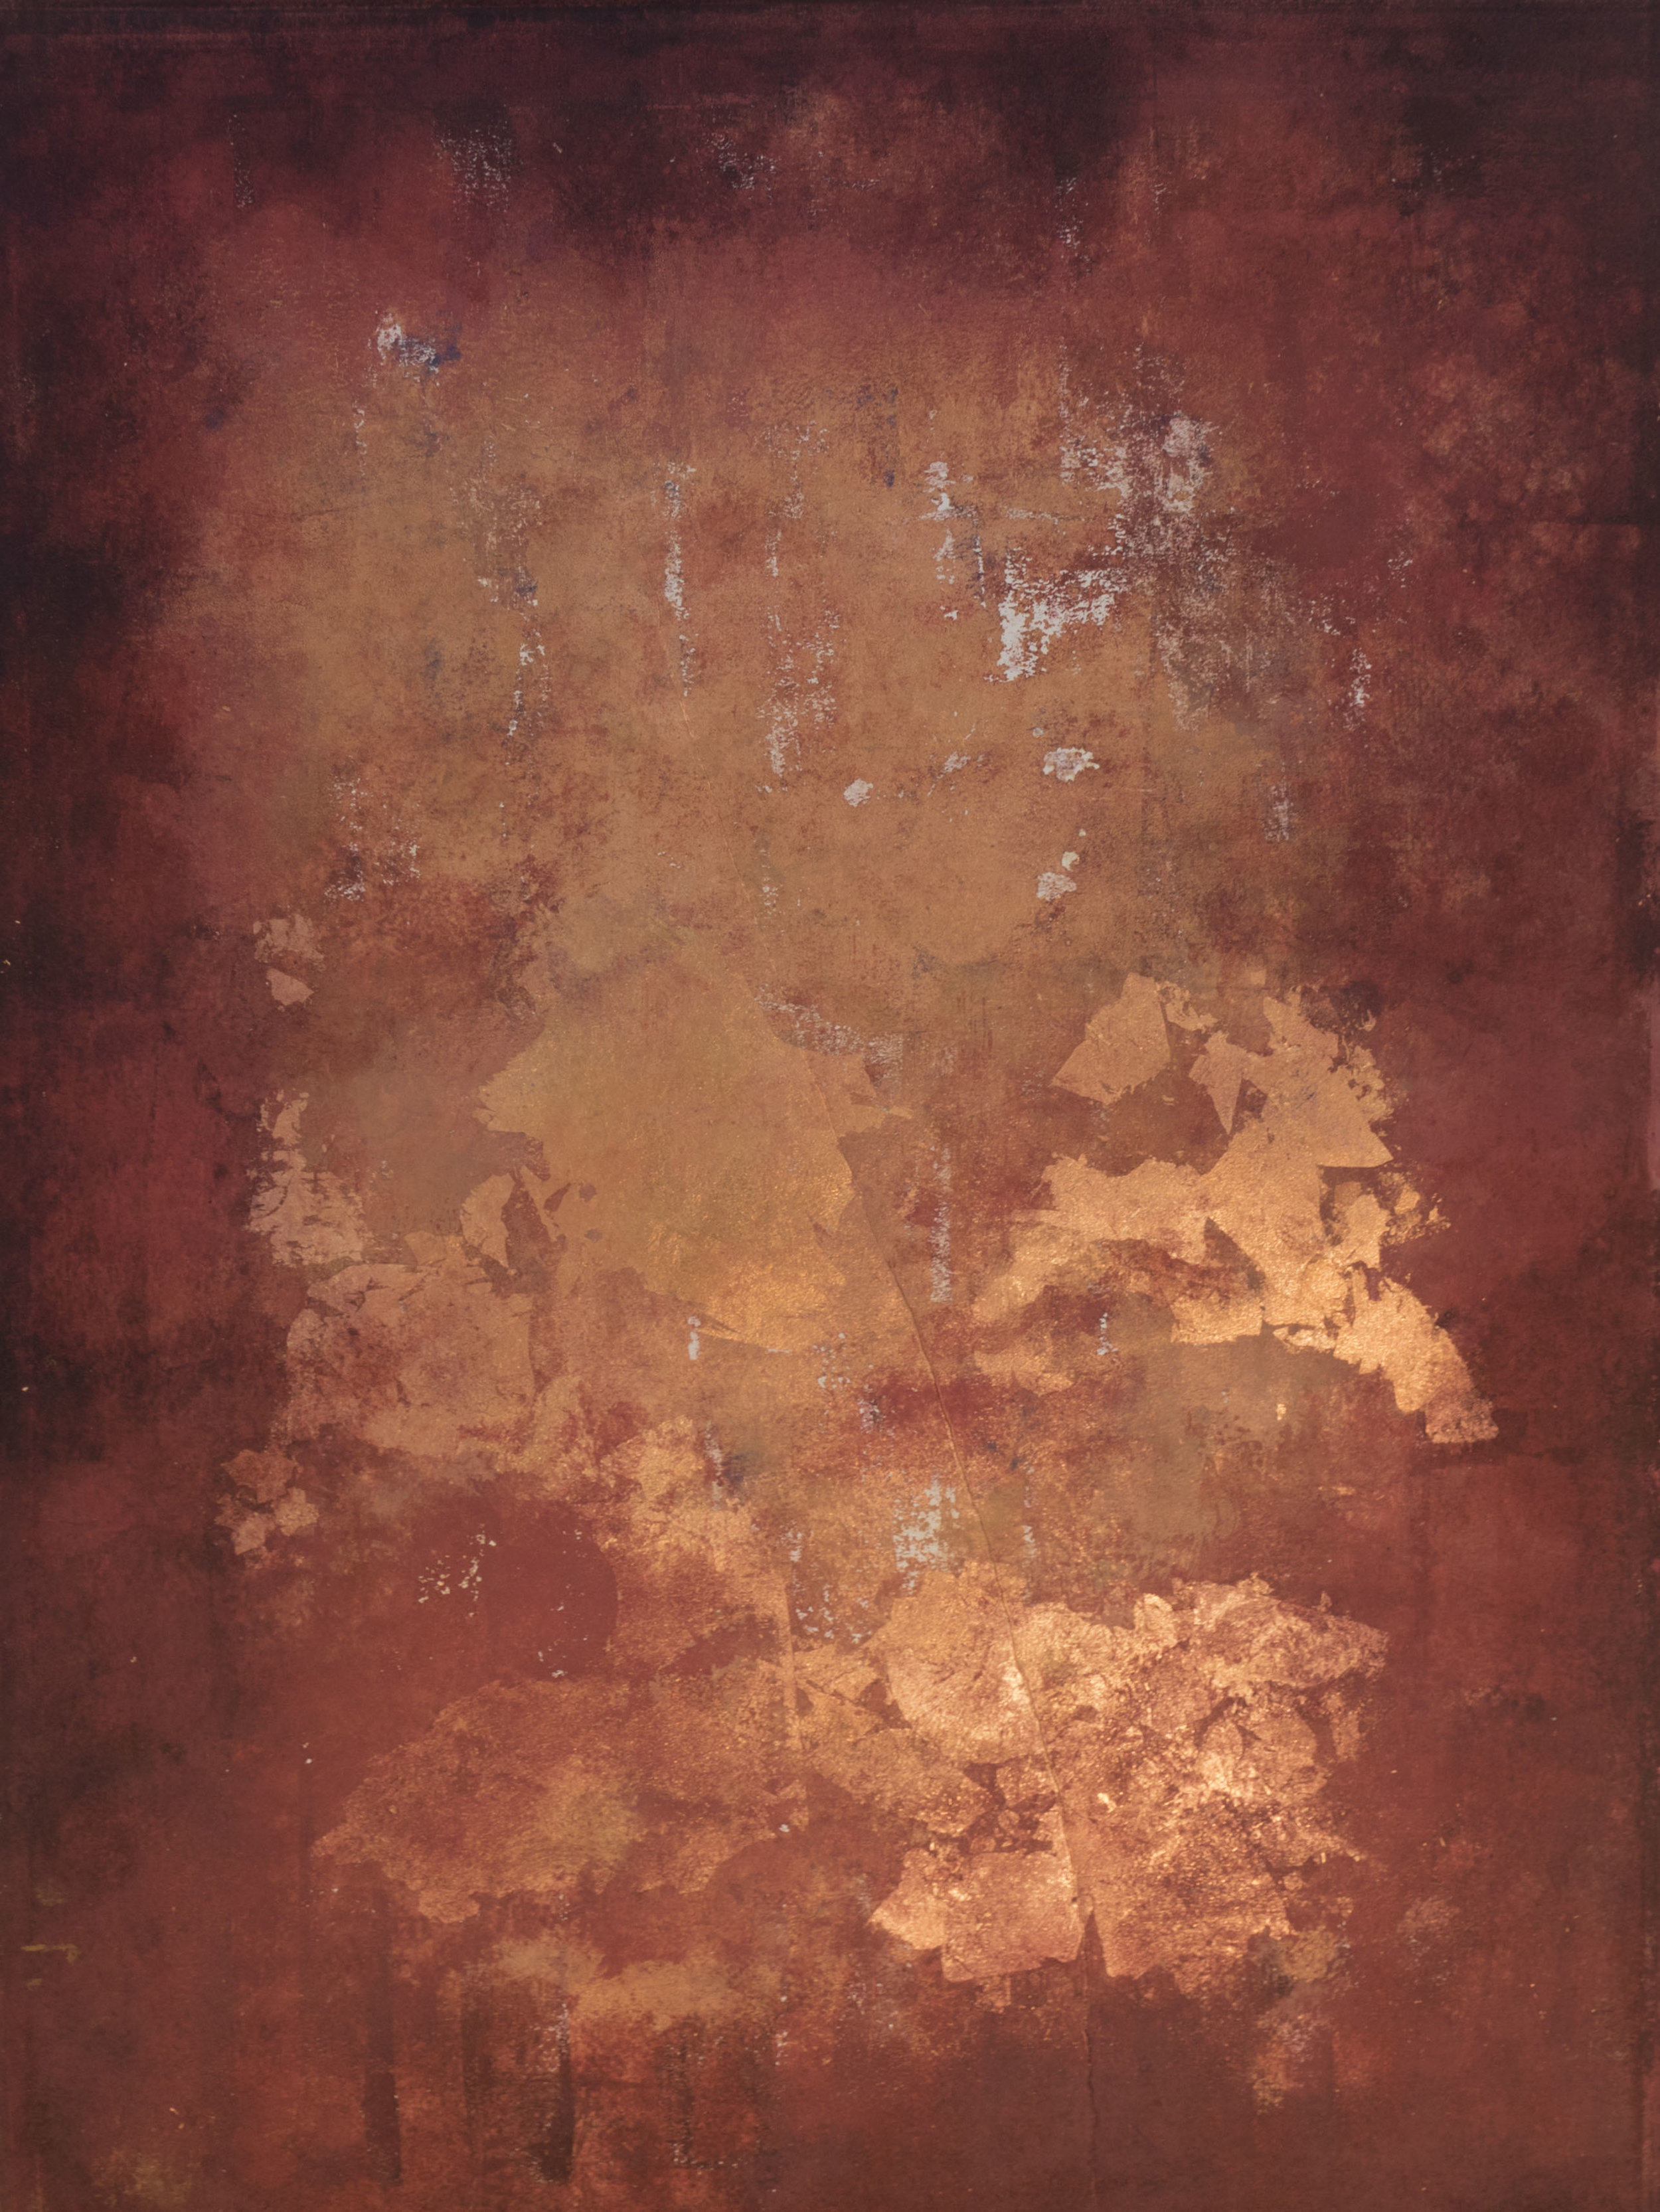 untitled. ink and copper leaf on BFK. 20x26. 2018